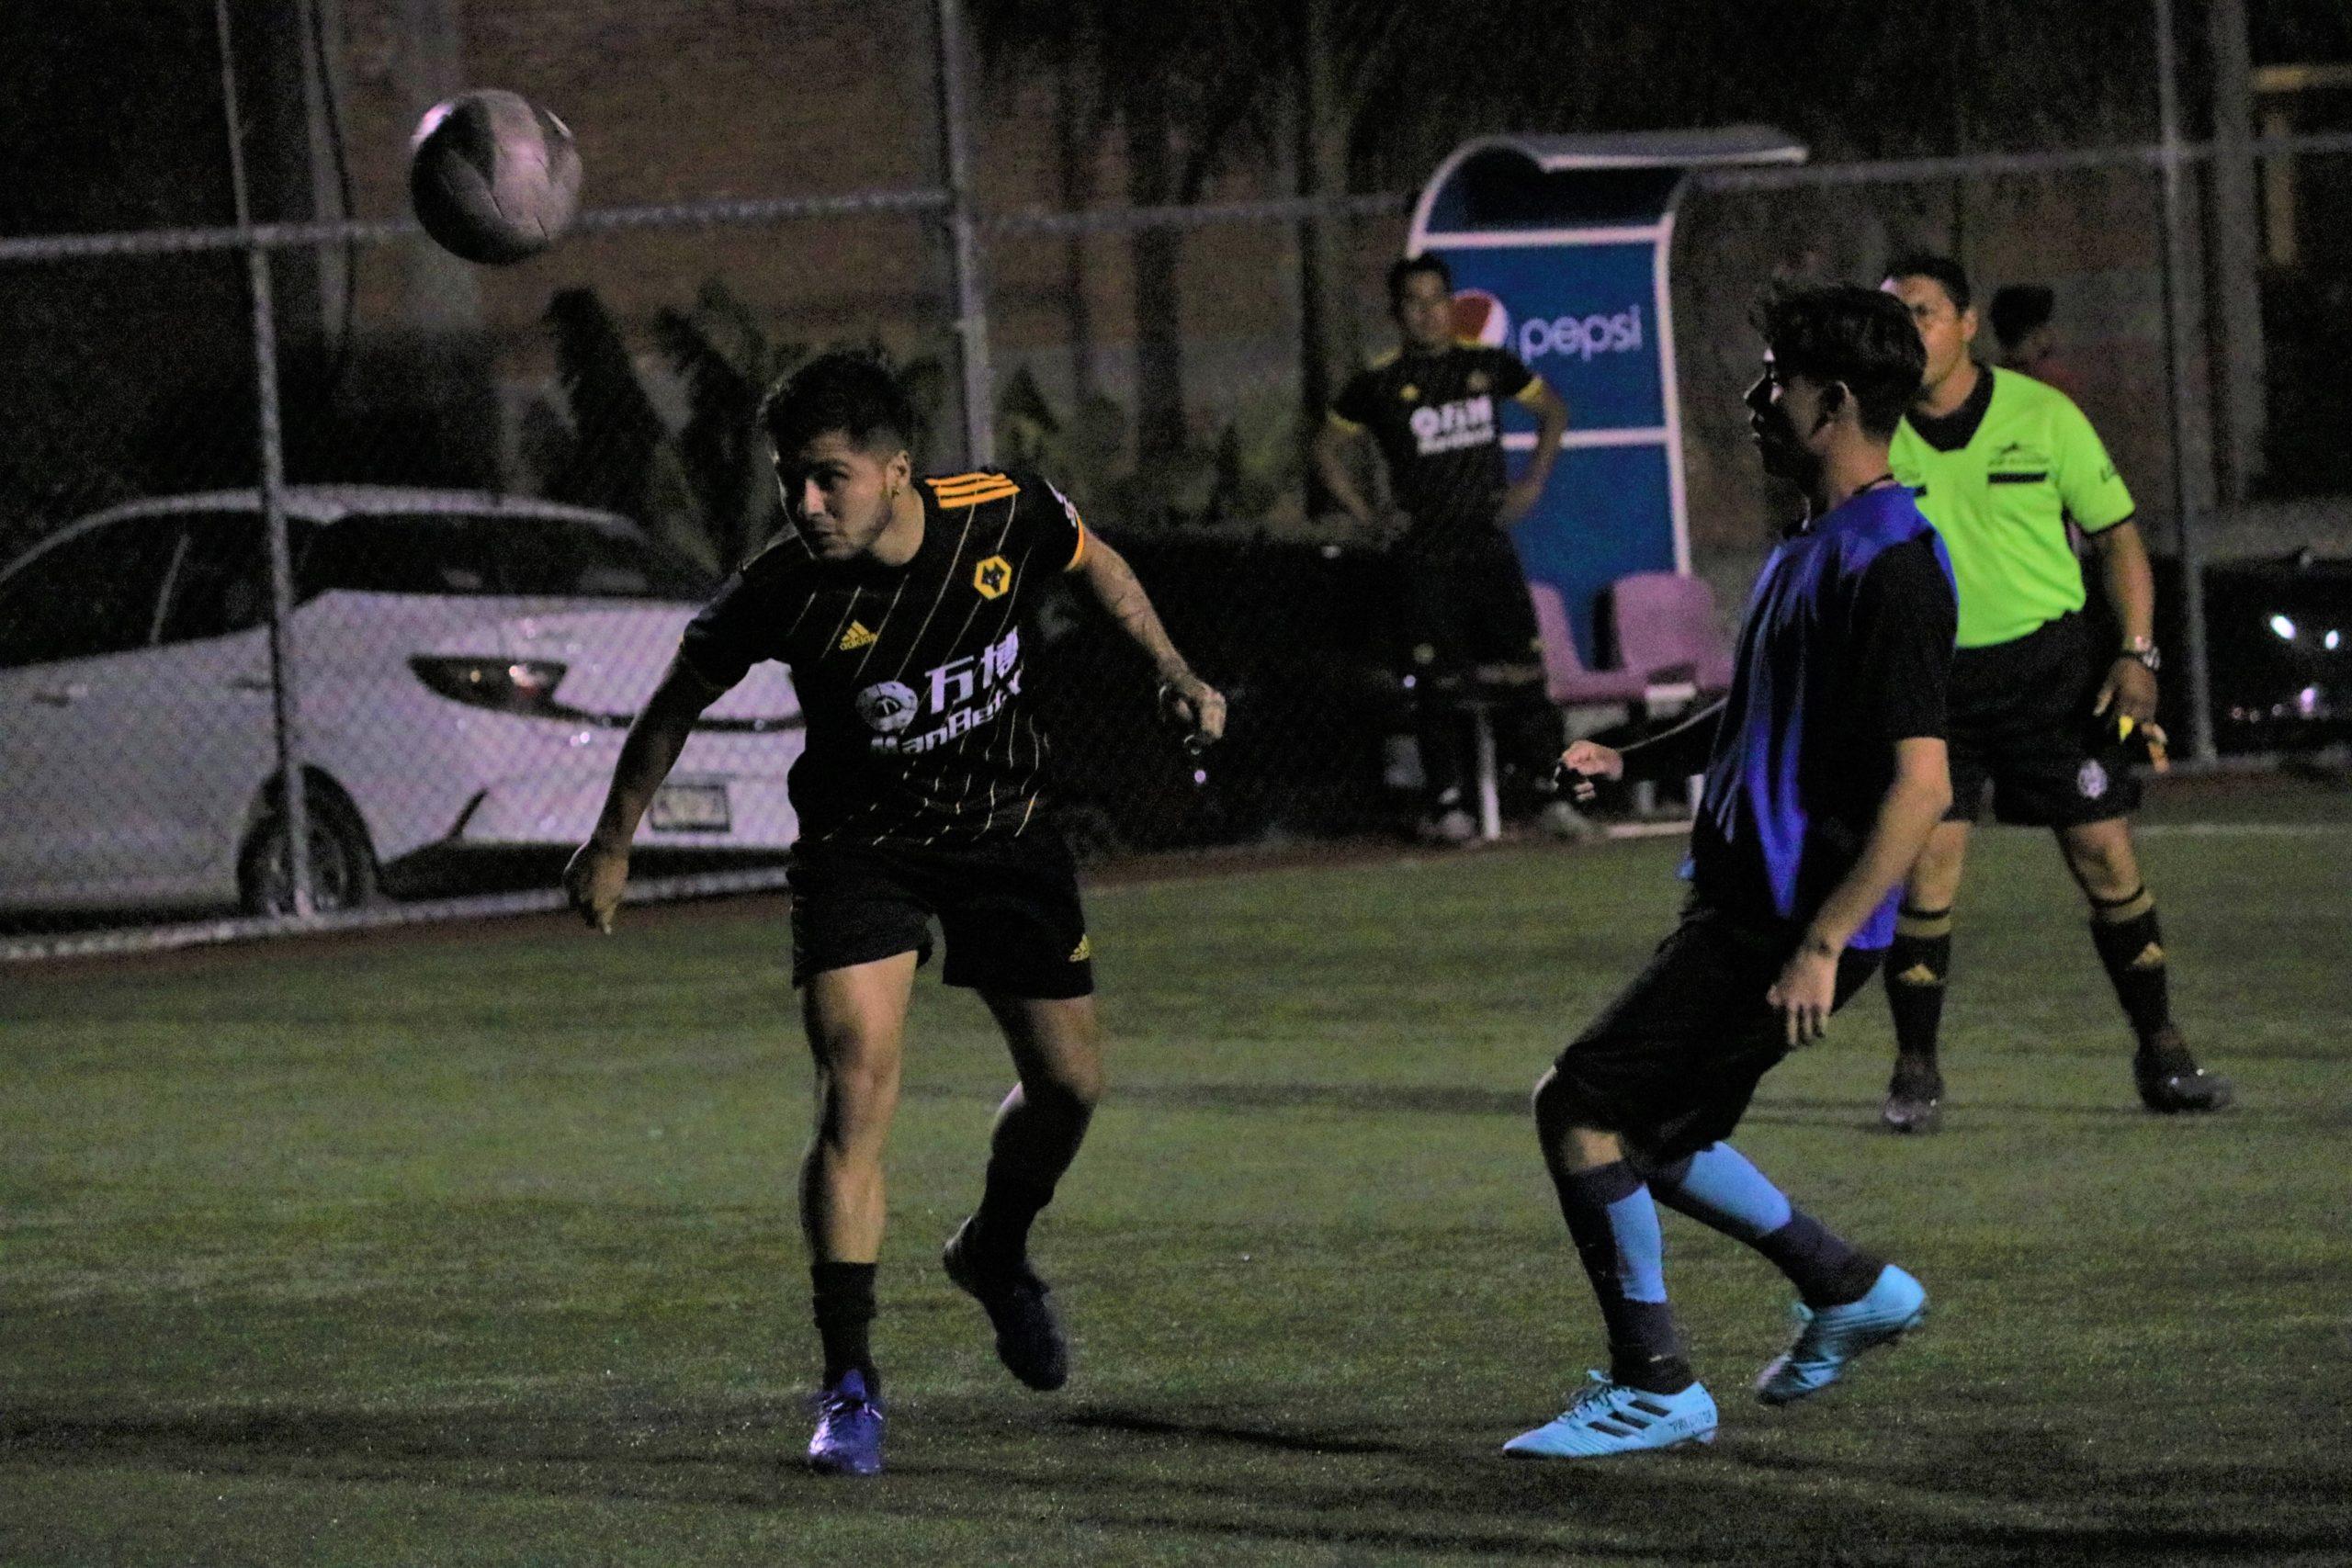 Oaxaca va a la Copa Villahermosa | El Imparcial de Oaxaca